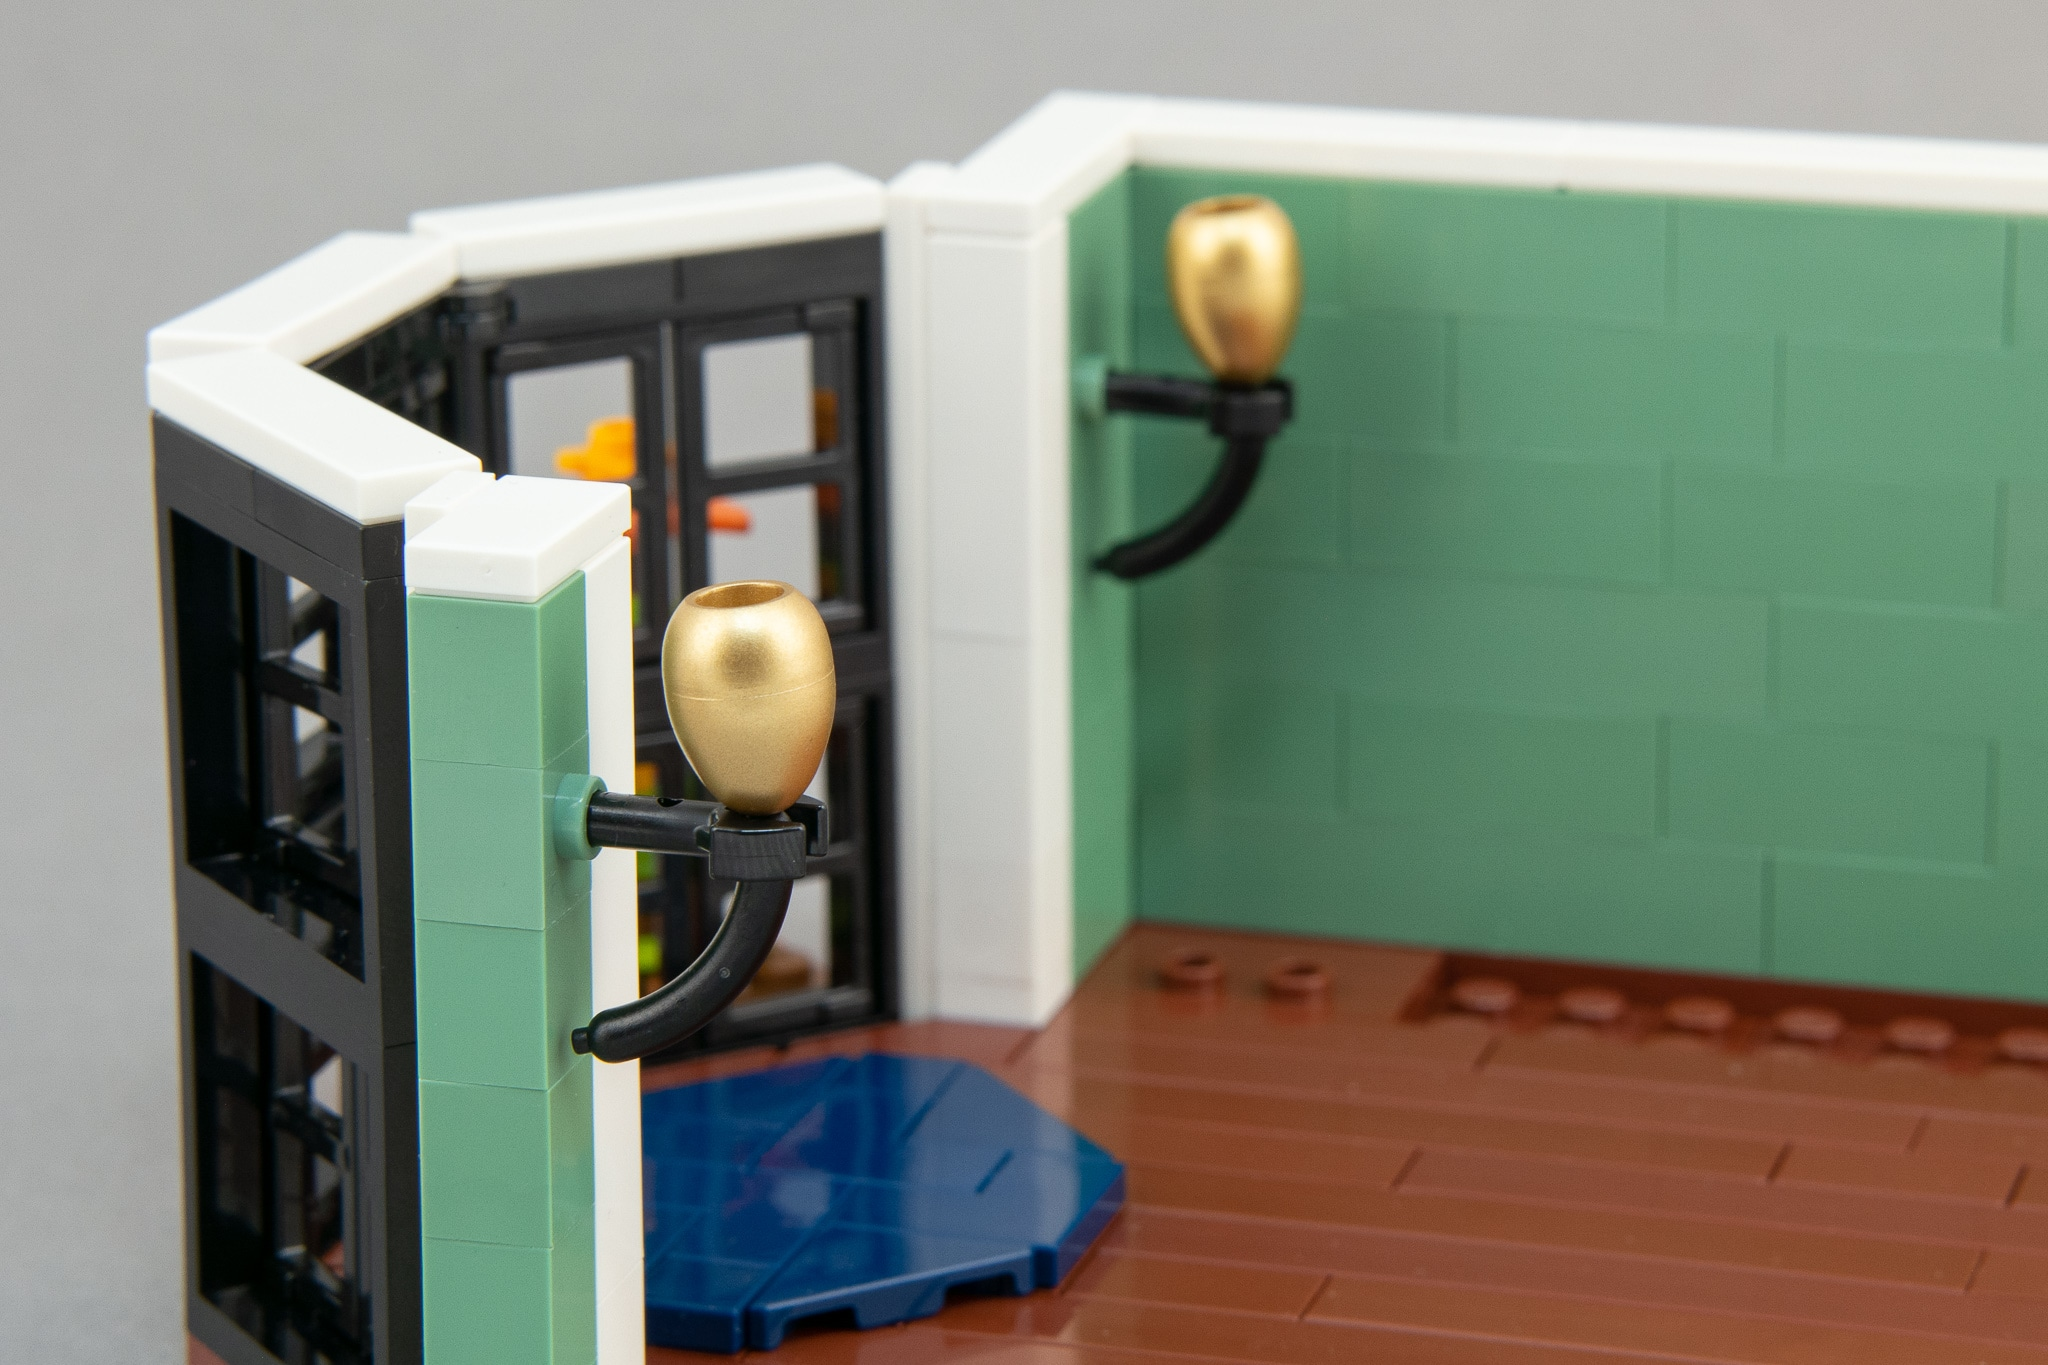 LEGO Moc Bausinpiration Esszimmer (14)